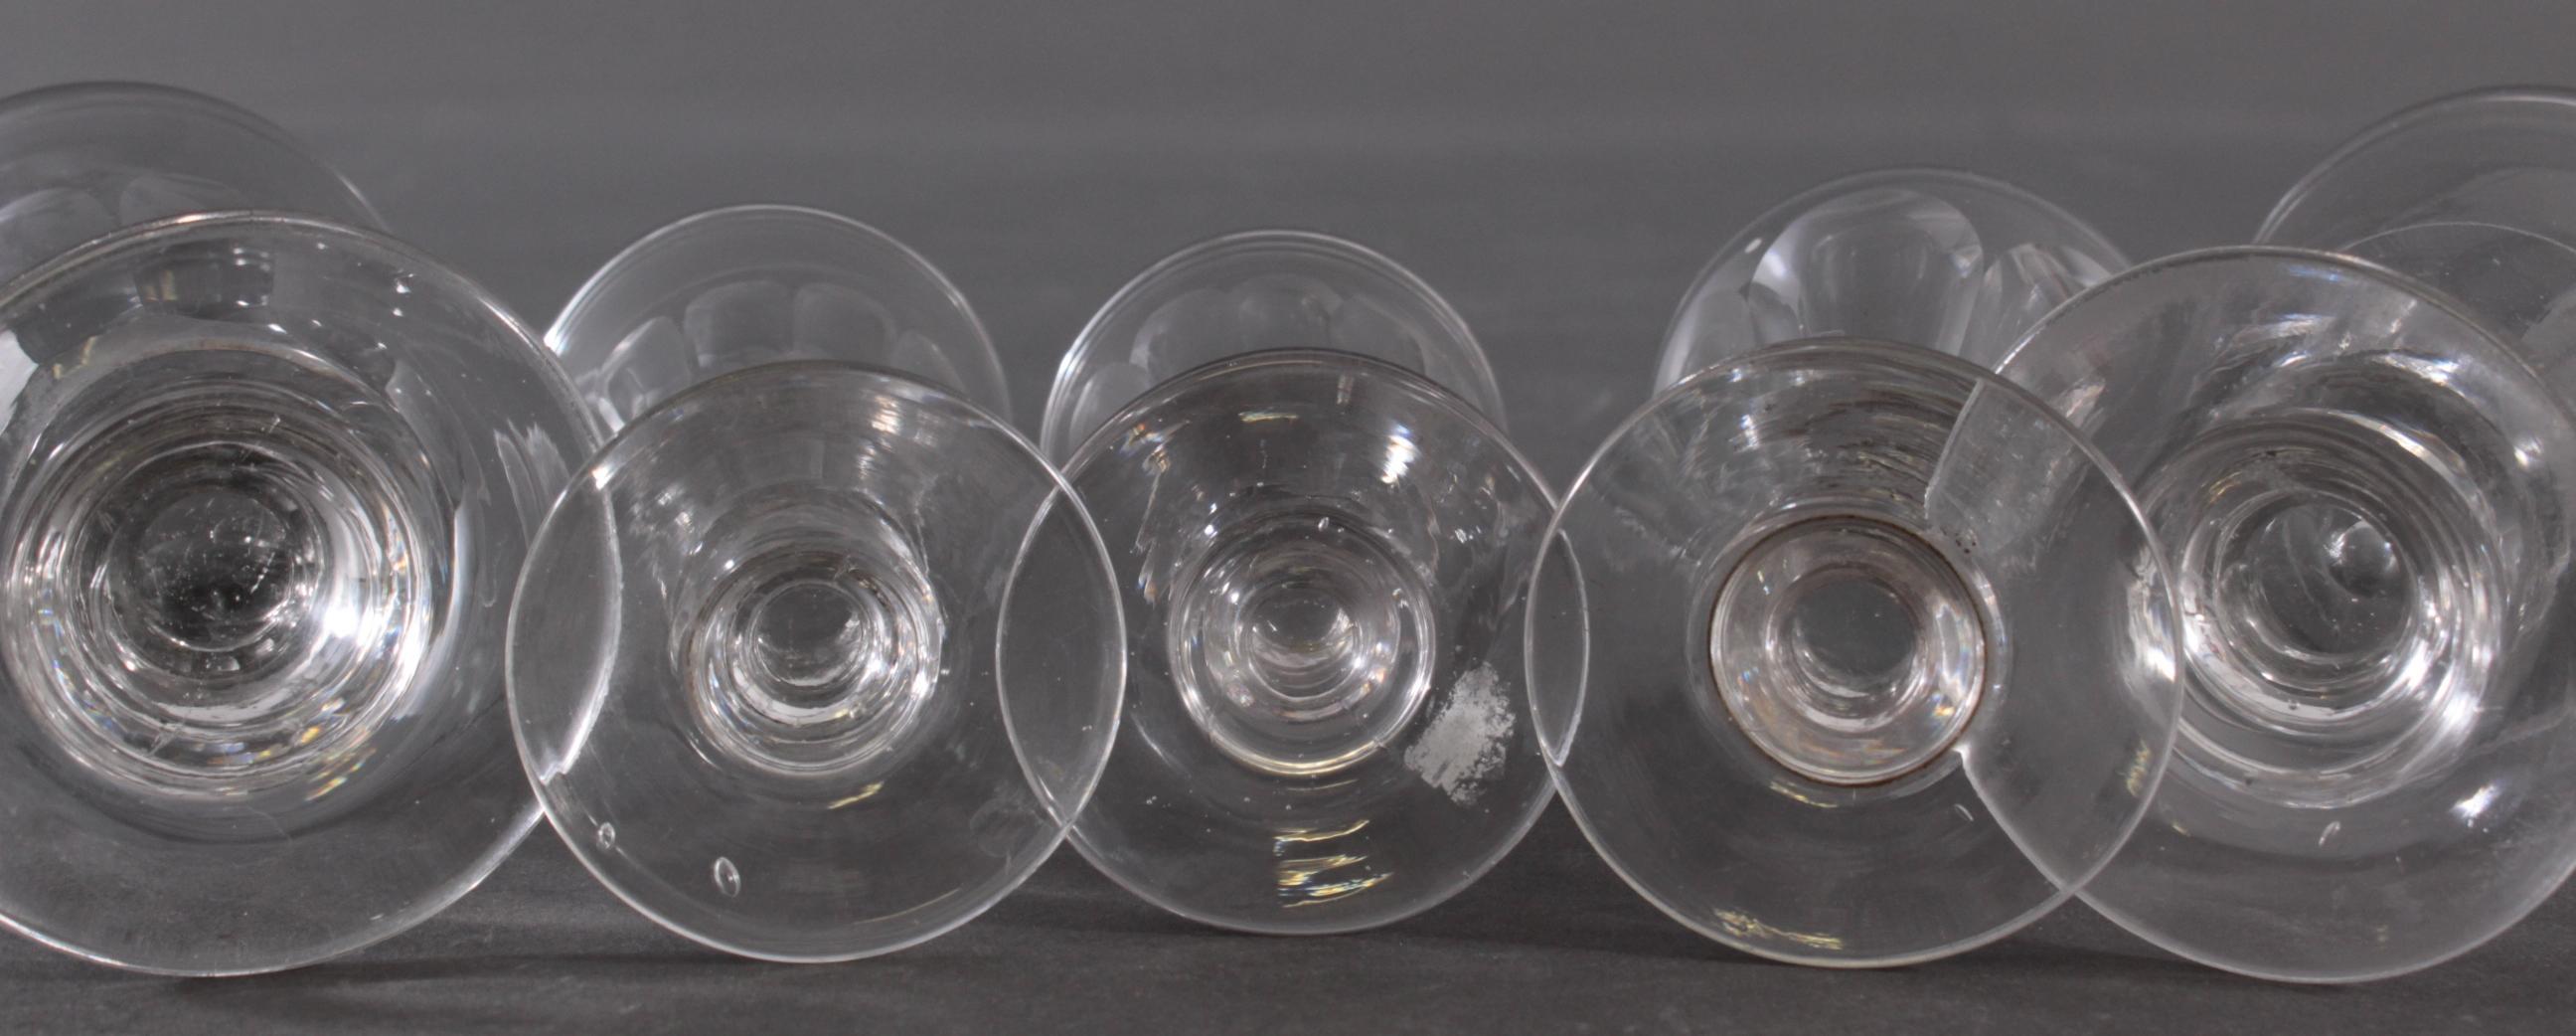 Fünf  Wein-/Absinthgläser, 19. Jahrhundert-5